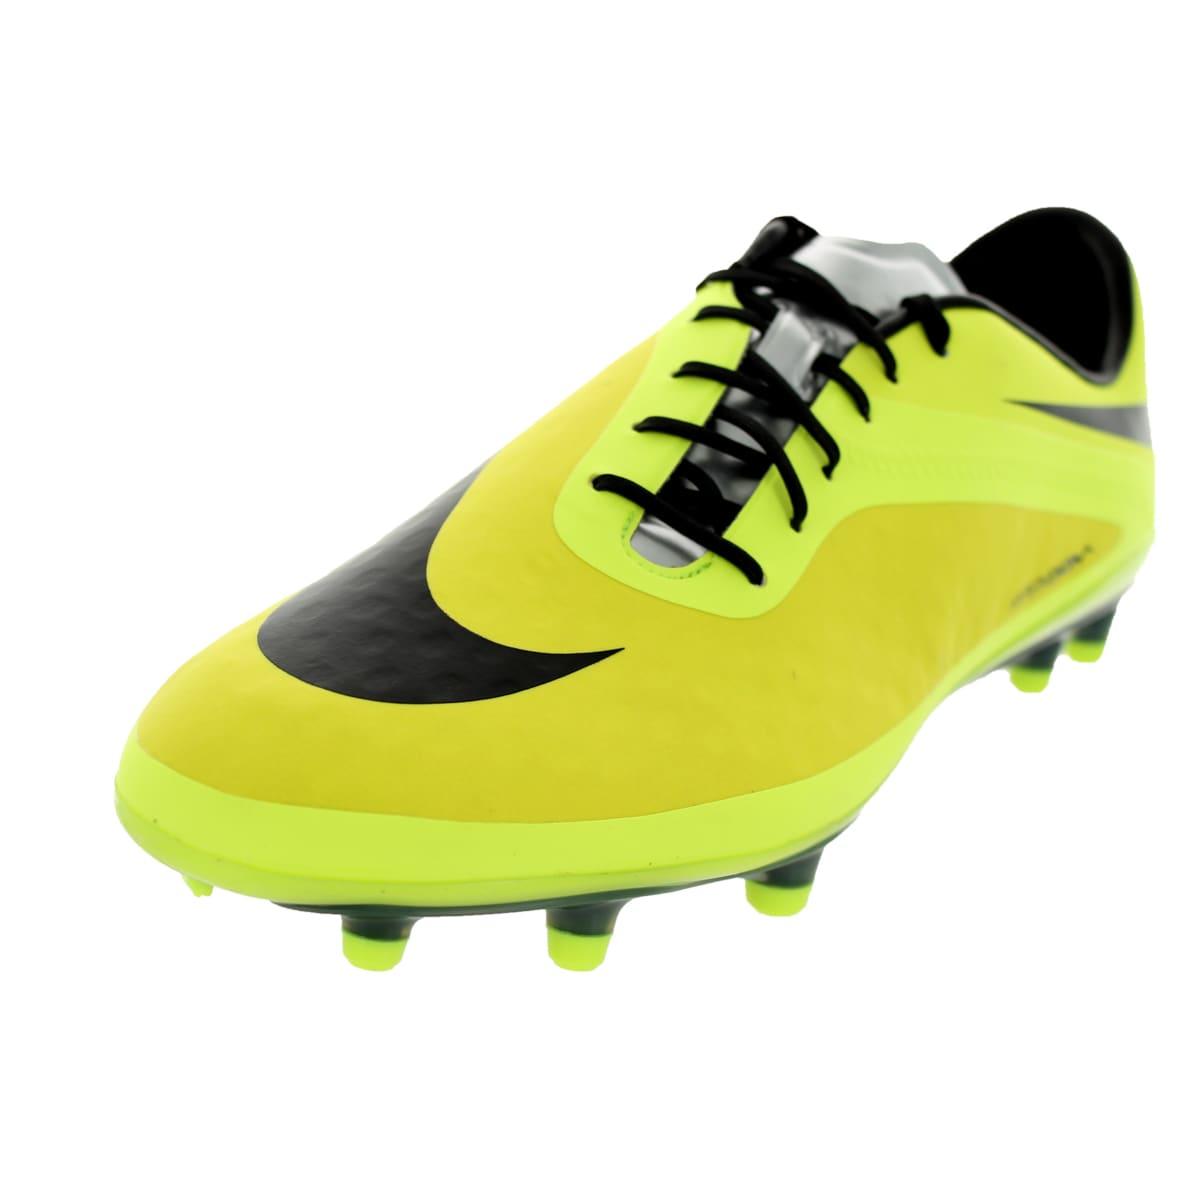 Nike Men's Hypervenom Phatal Yellow/Black Leather/Synthet...